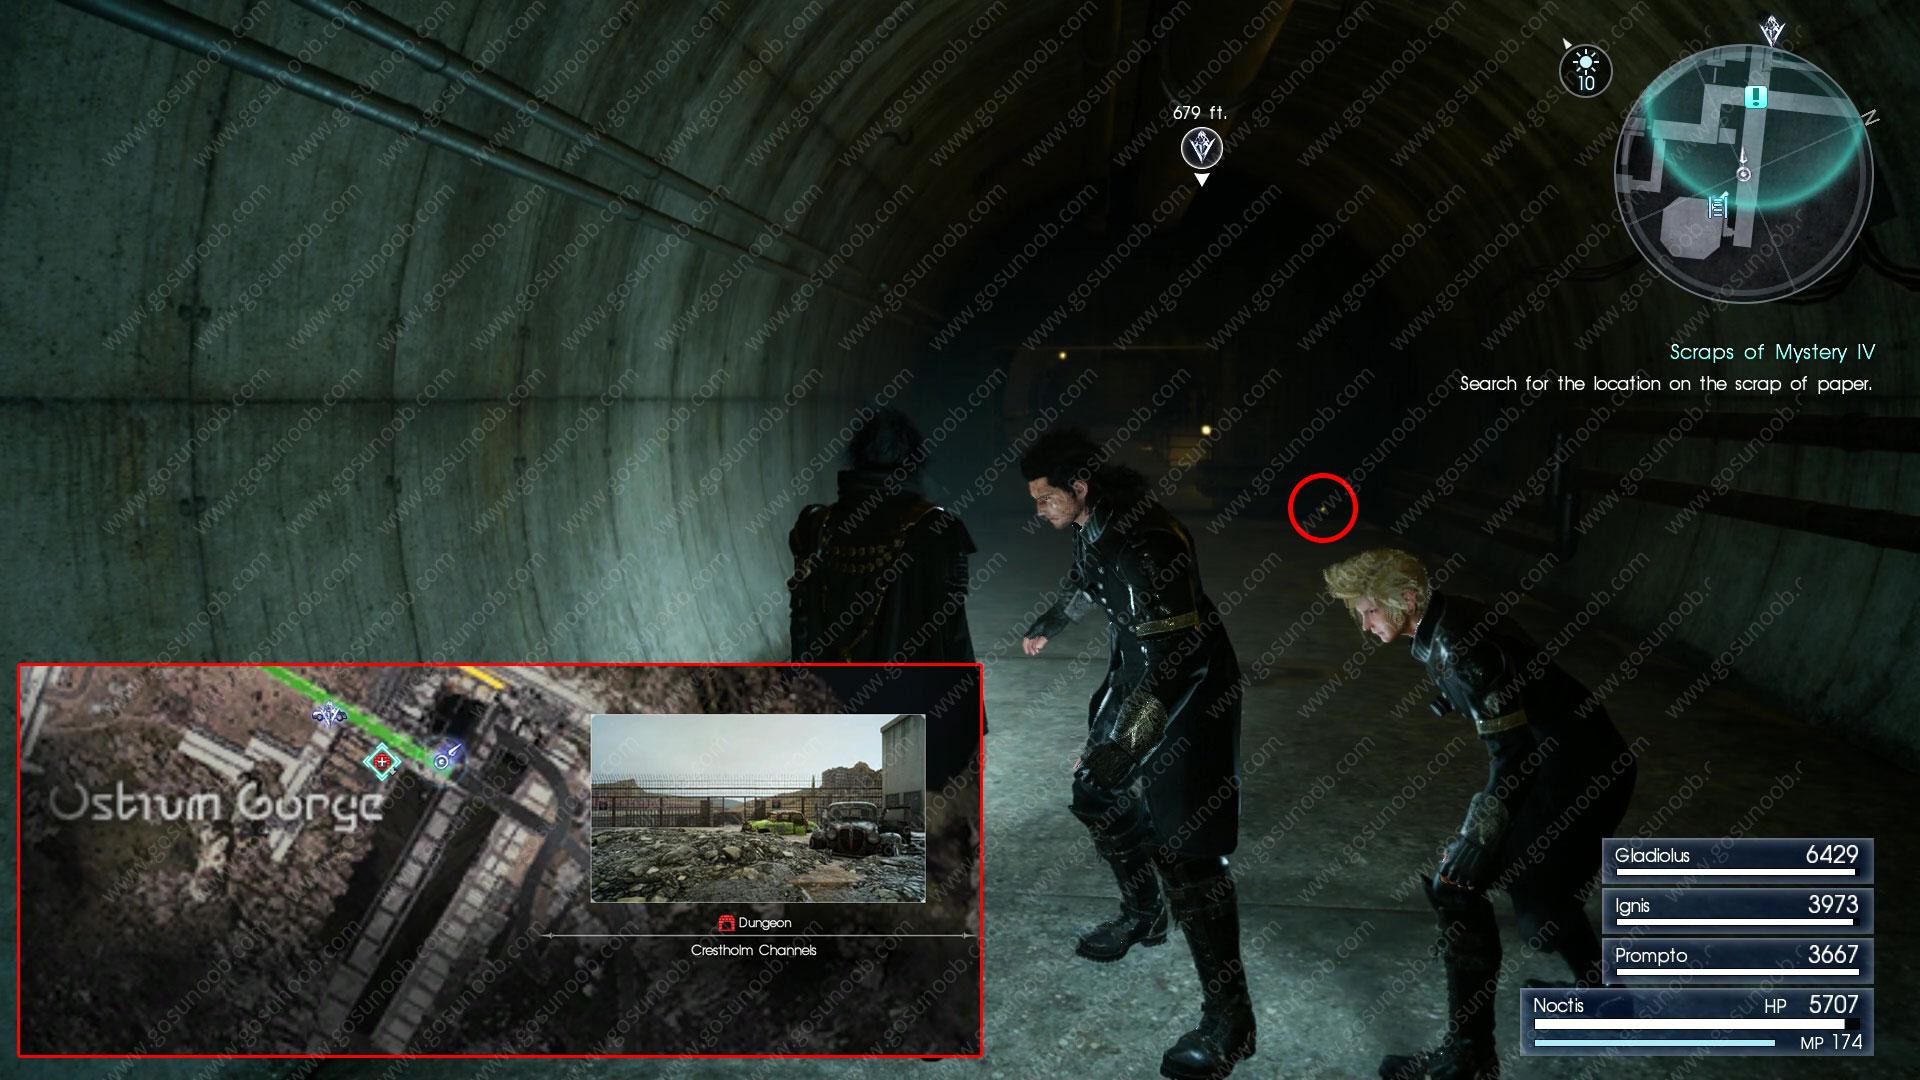 scraps of mystery IV scrap location